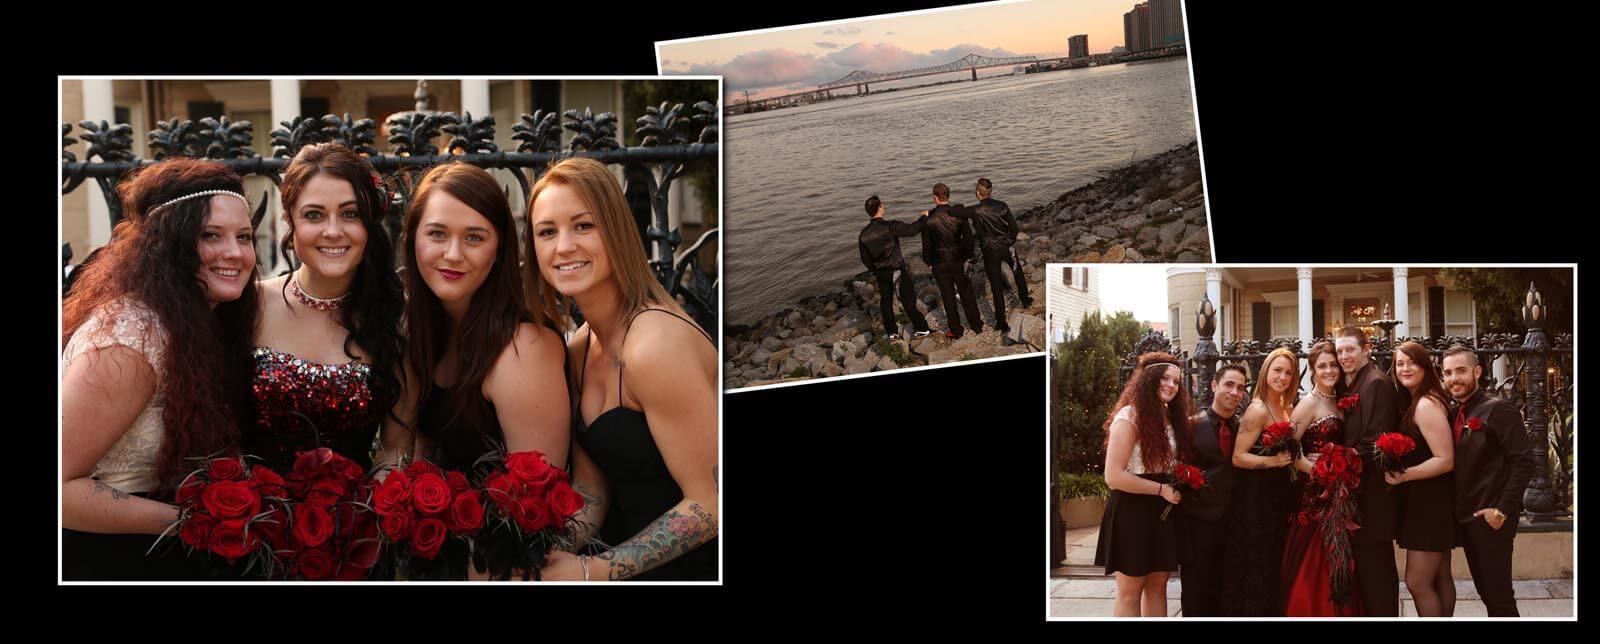 New-Orleans-Louisiana-Destination-wedding-photographer-07.jpg